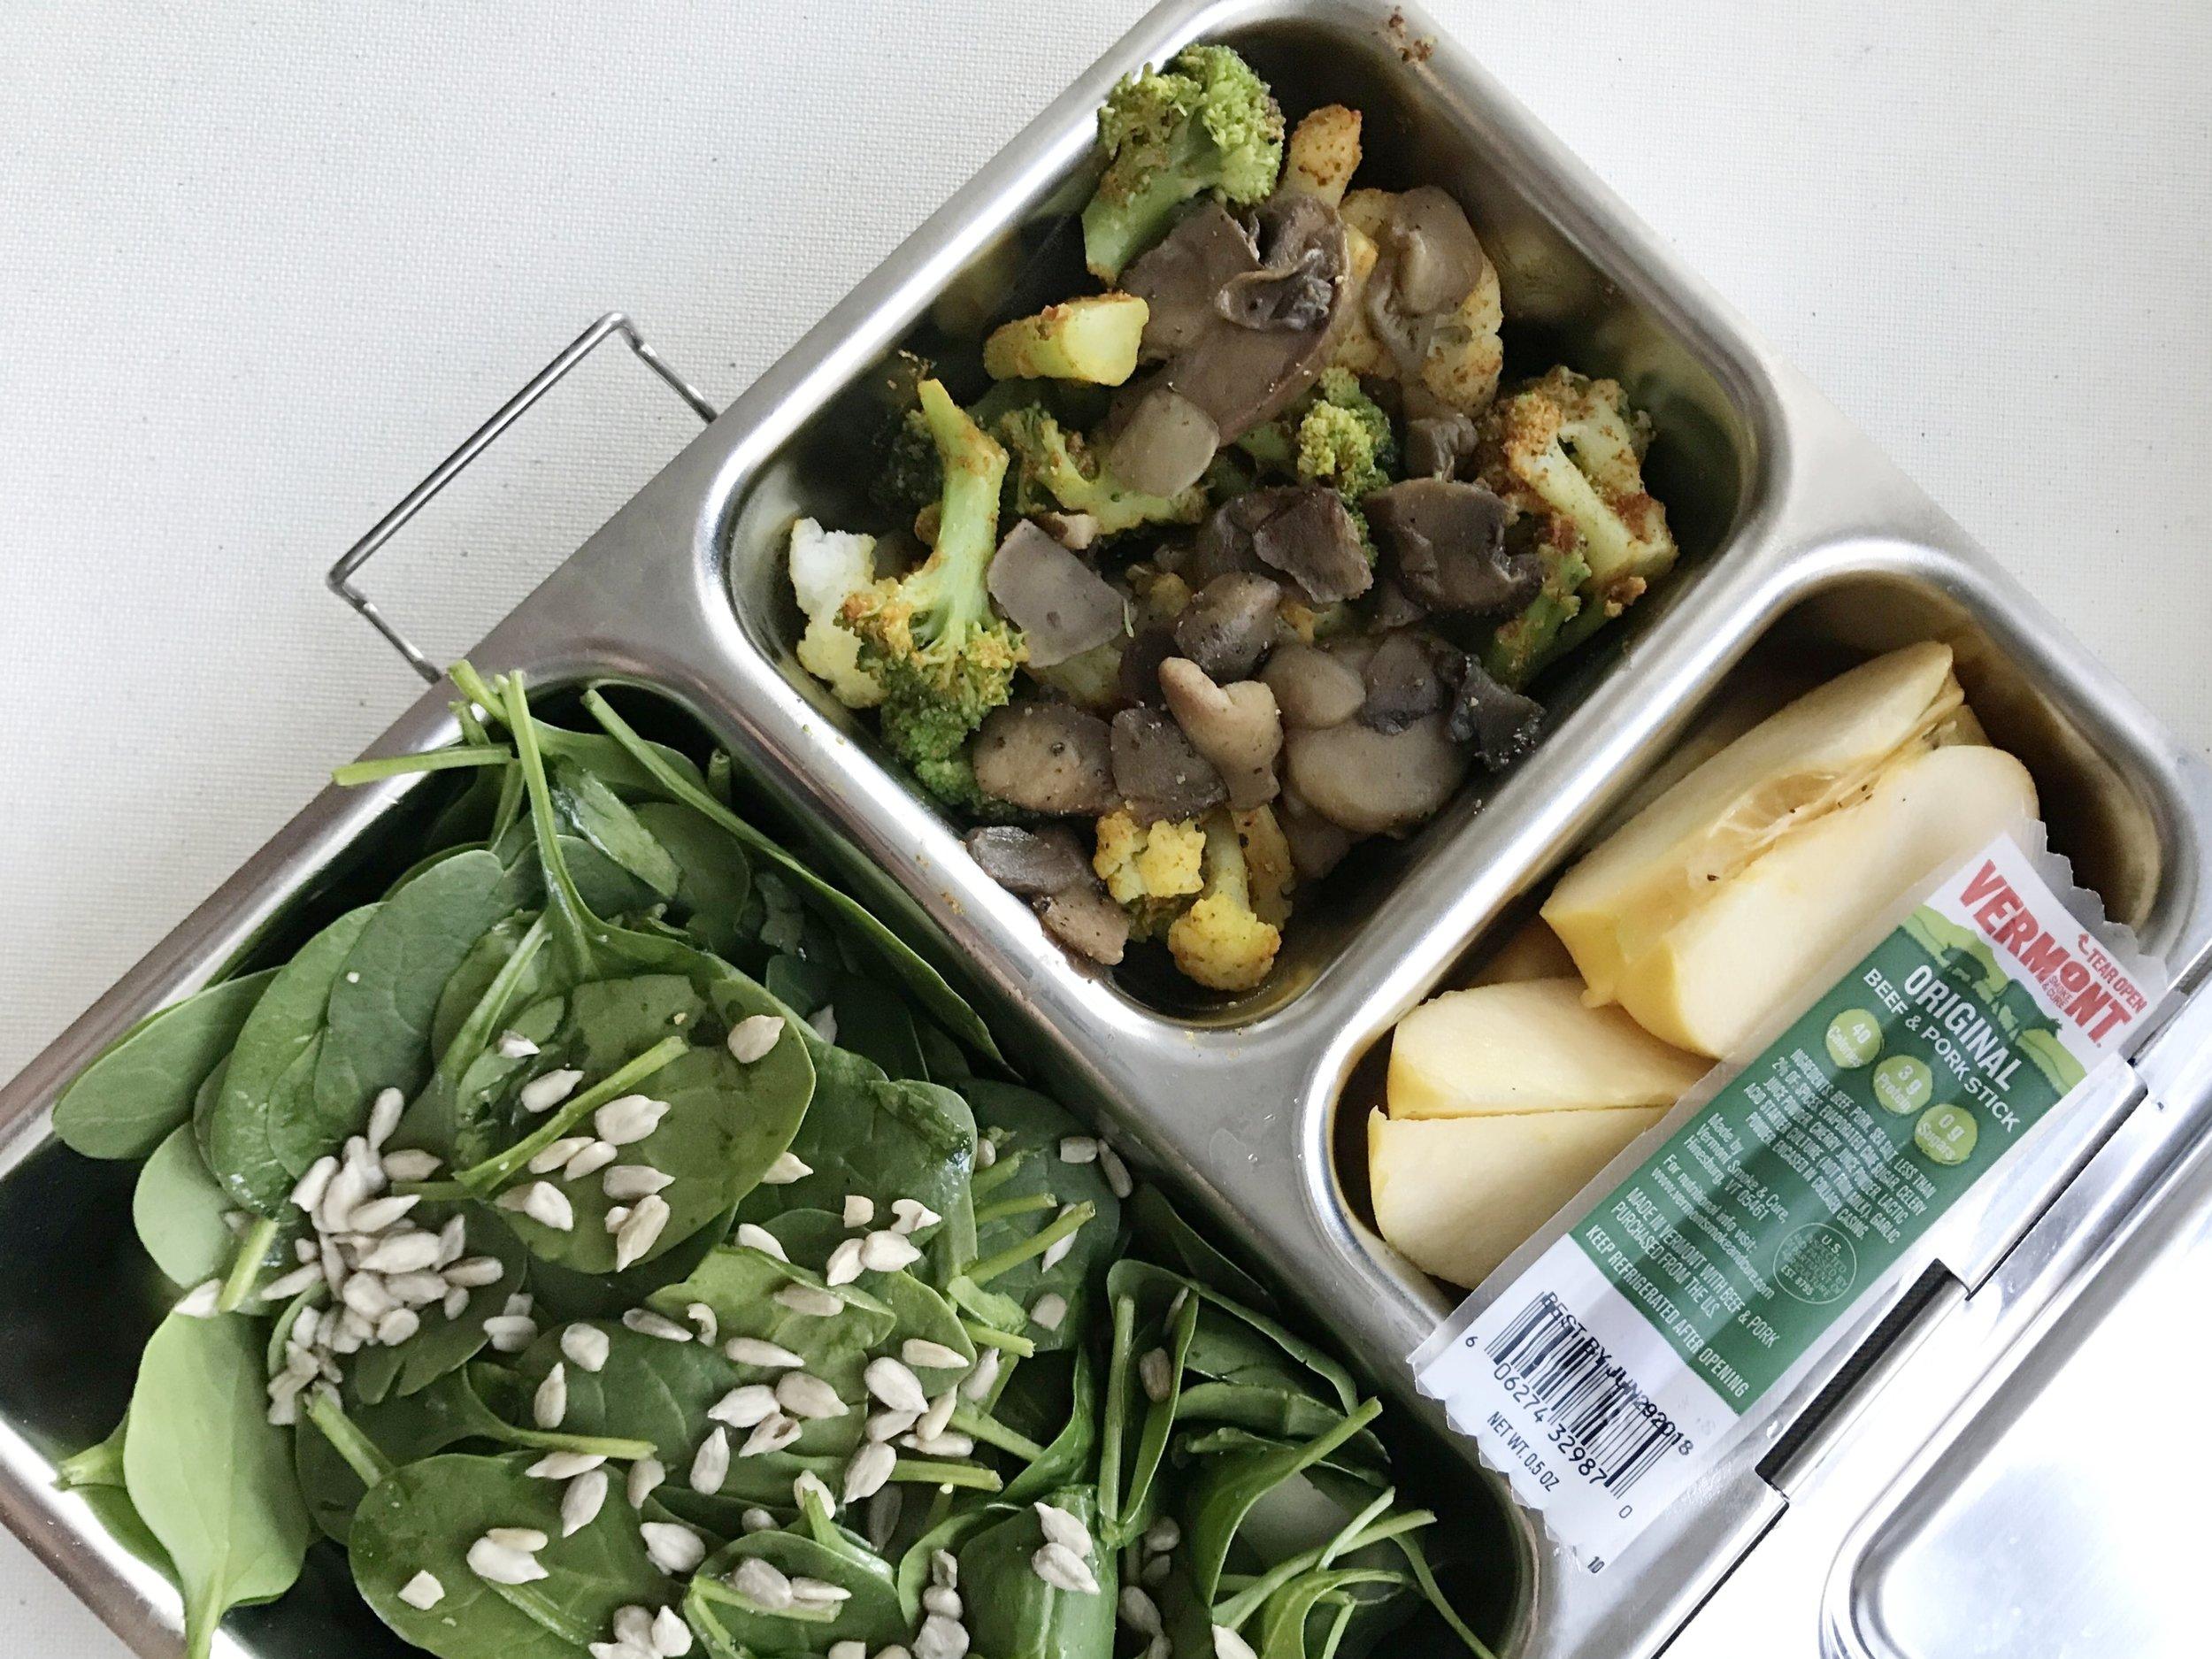 Sweetgreen Copycat Curry Cauliflower Salad